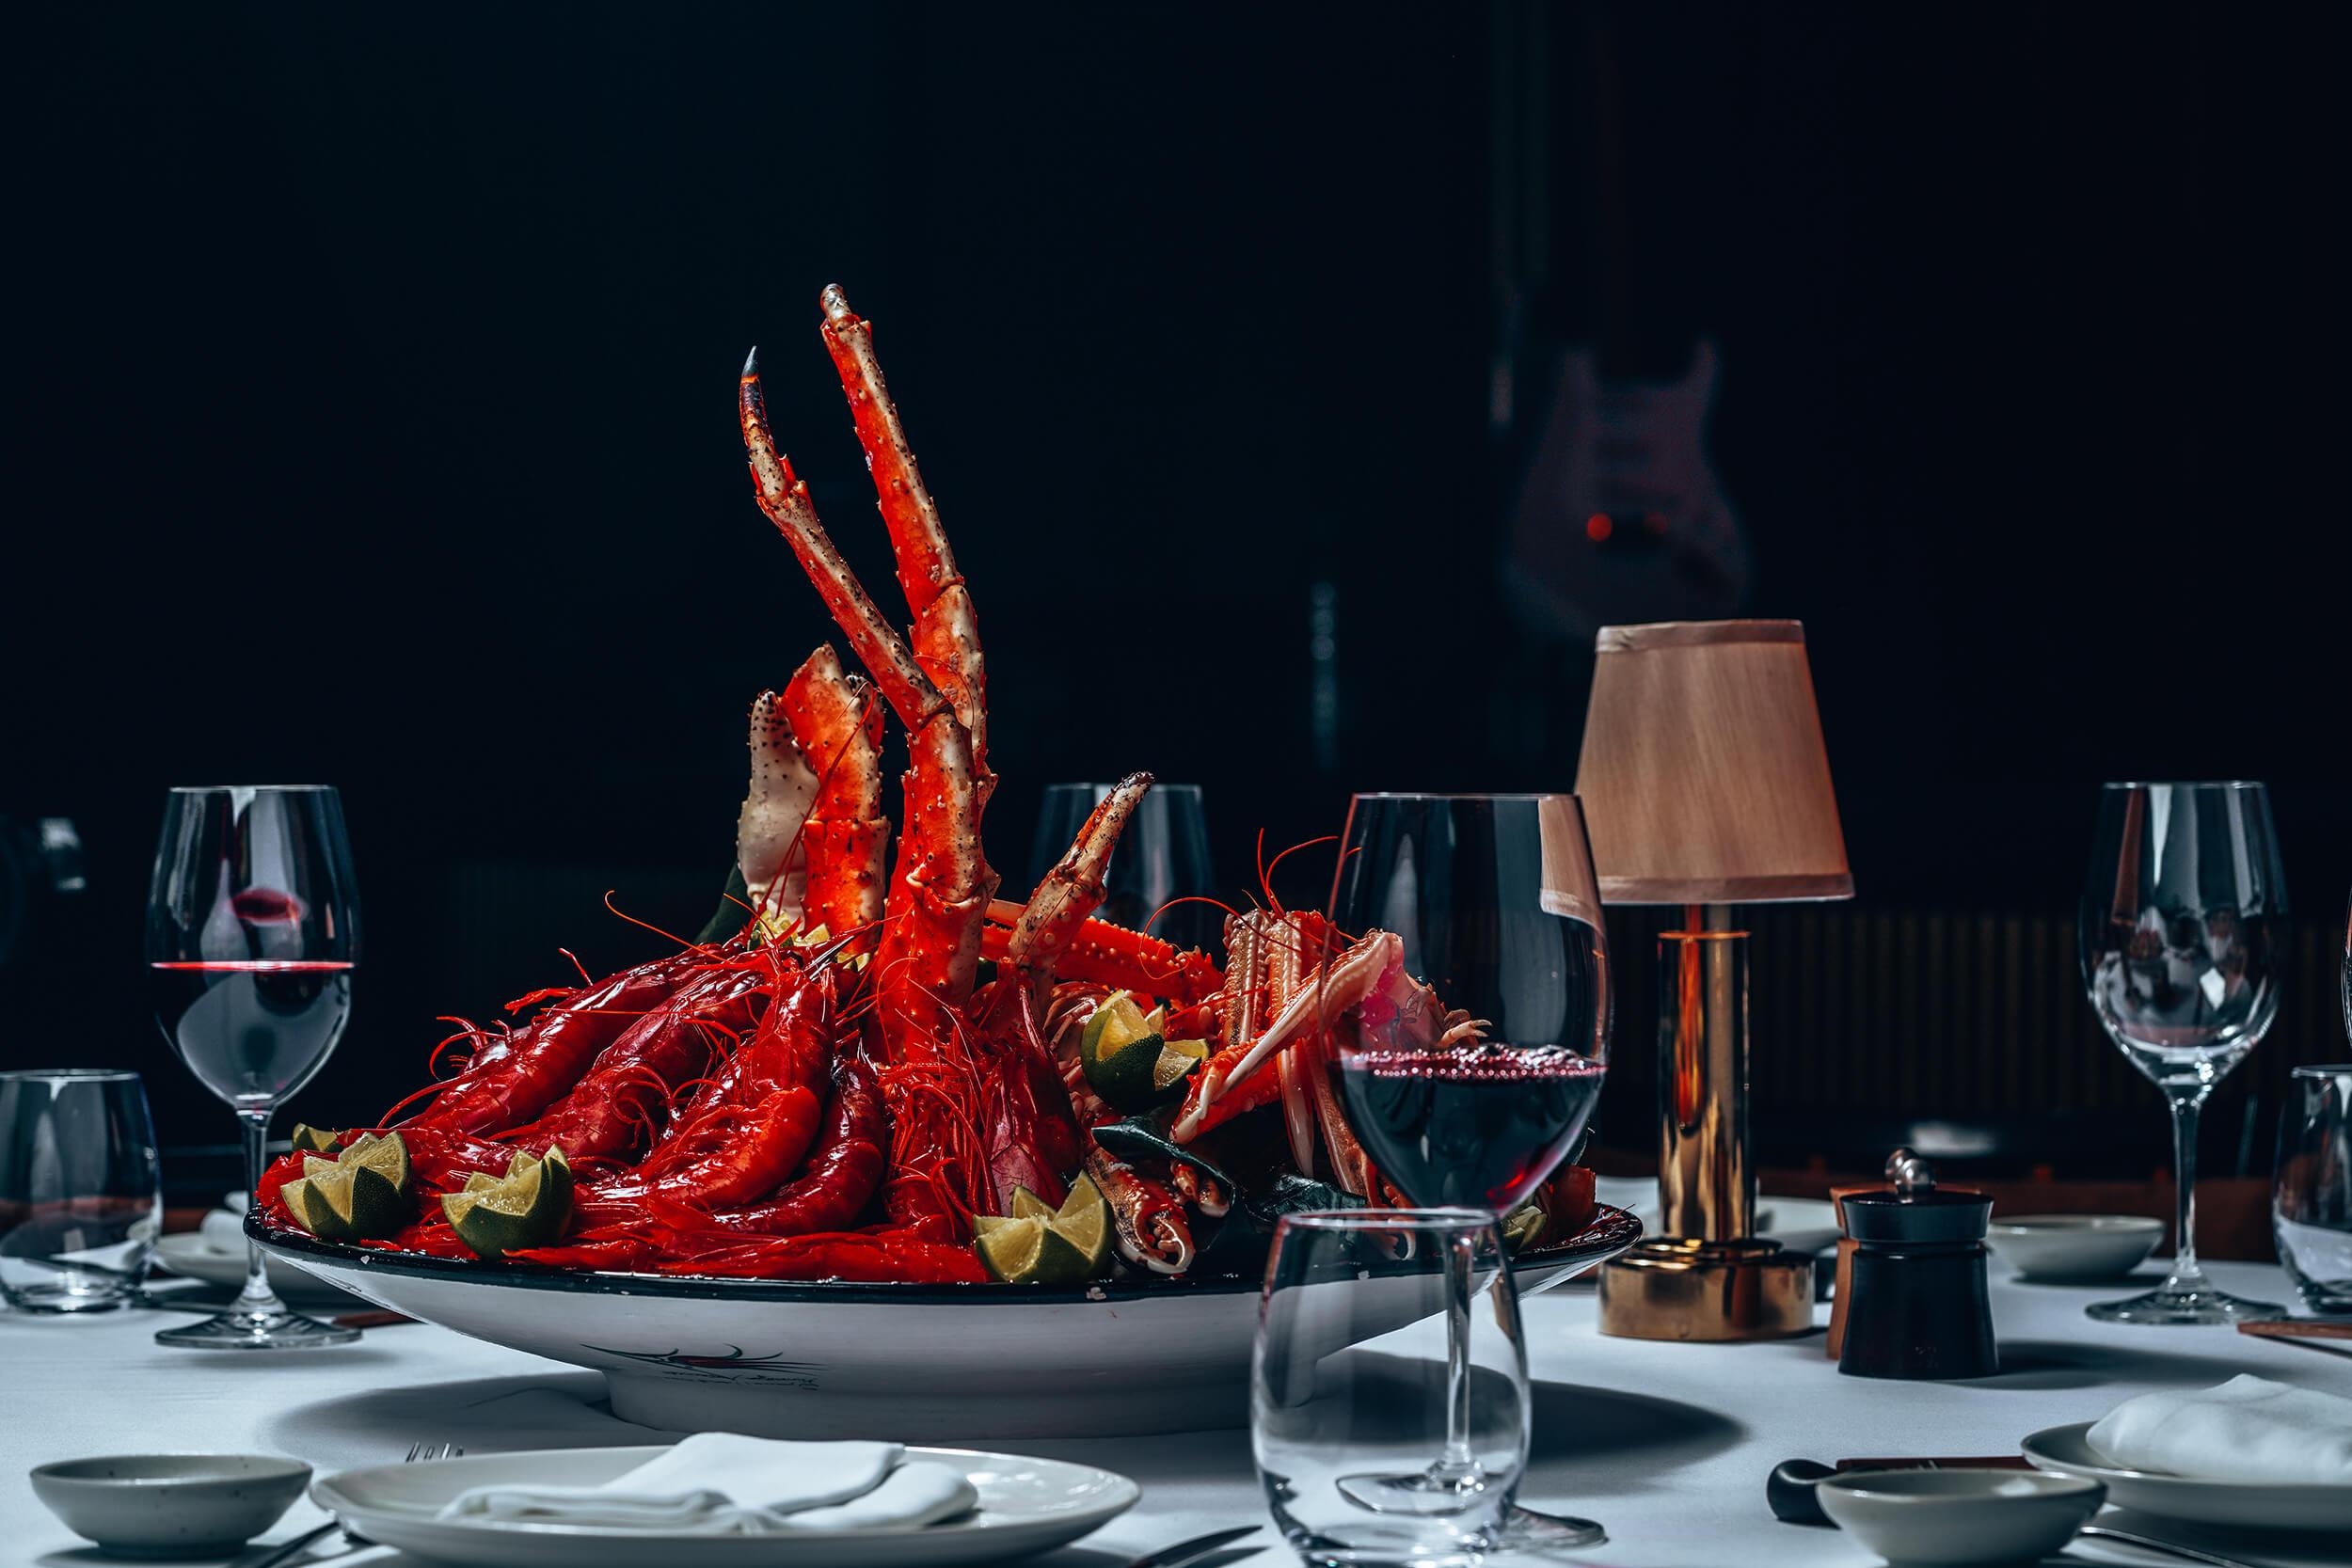 Seafood at Billionaire Dubai